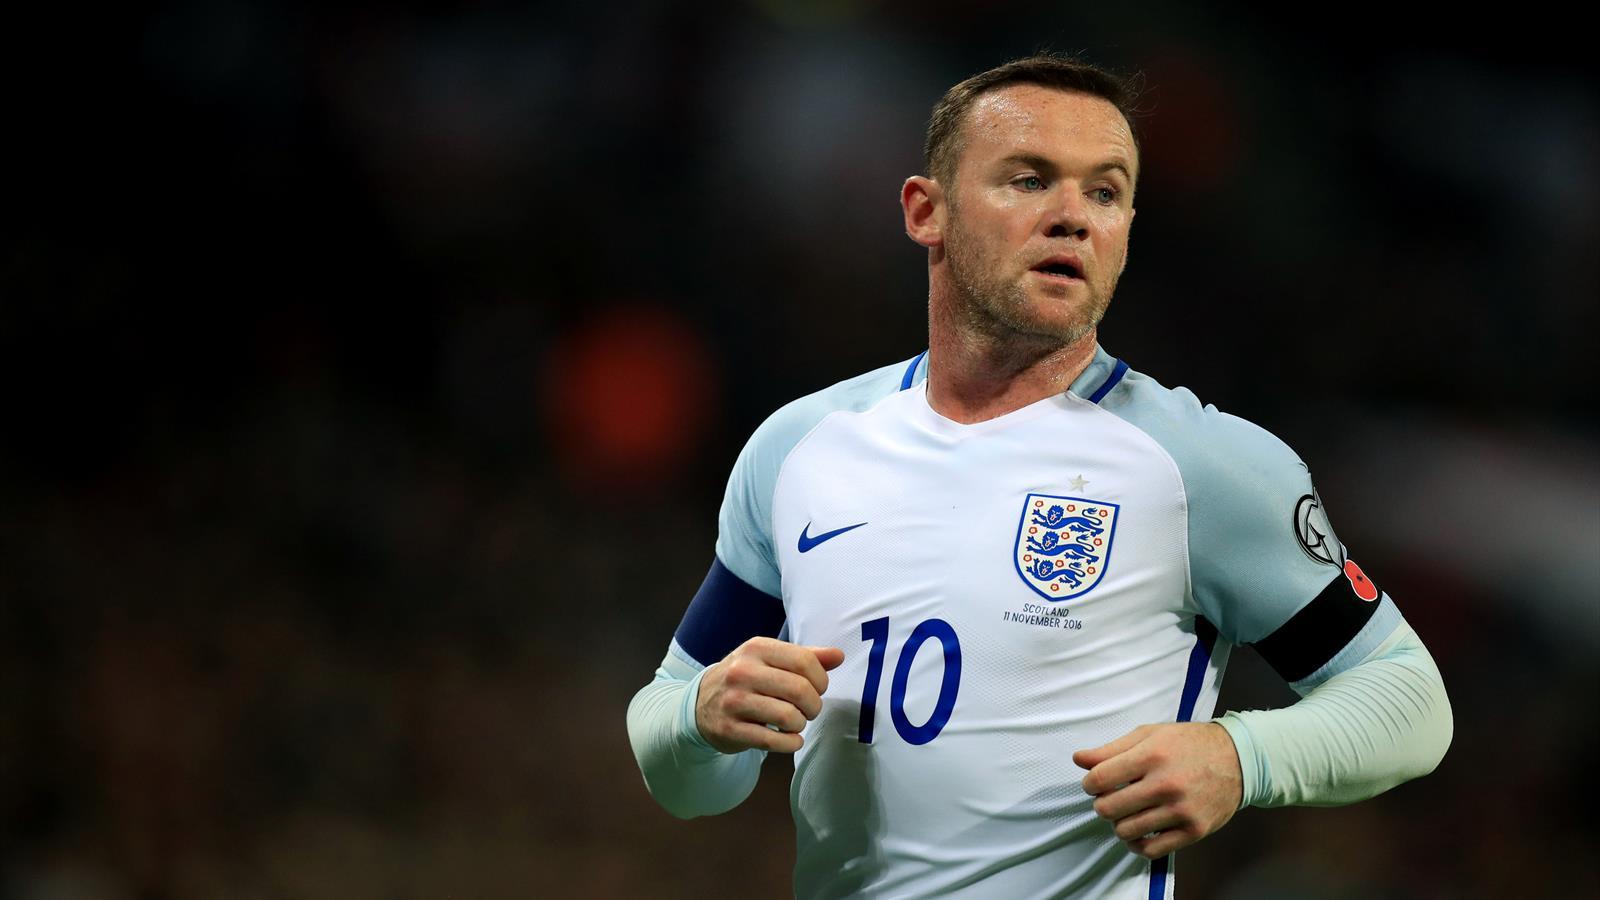 Wayne Rooney to make farewell England appearance against US - Football - Eurosport Australia